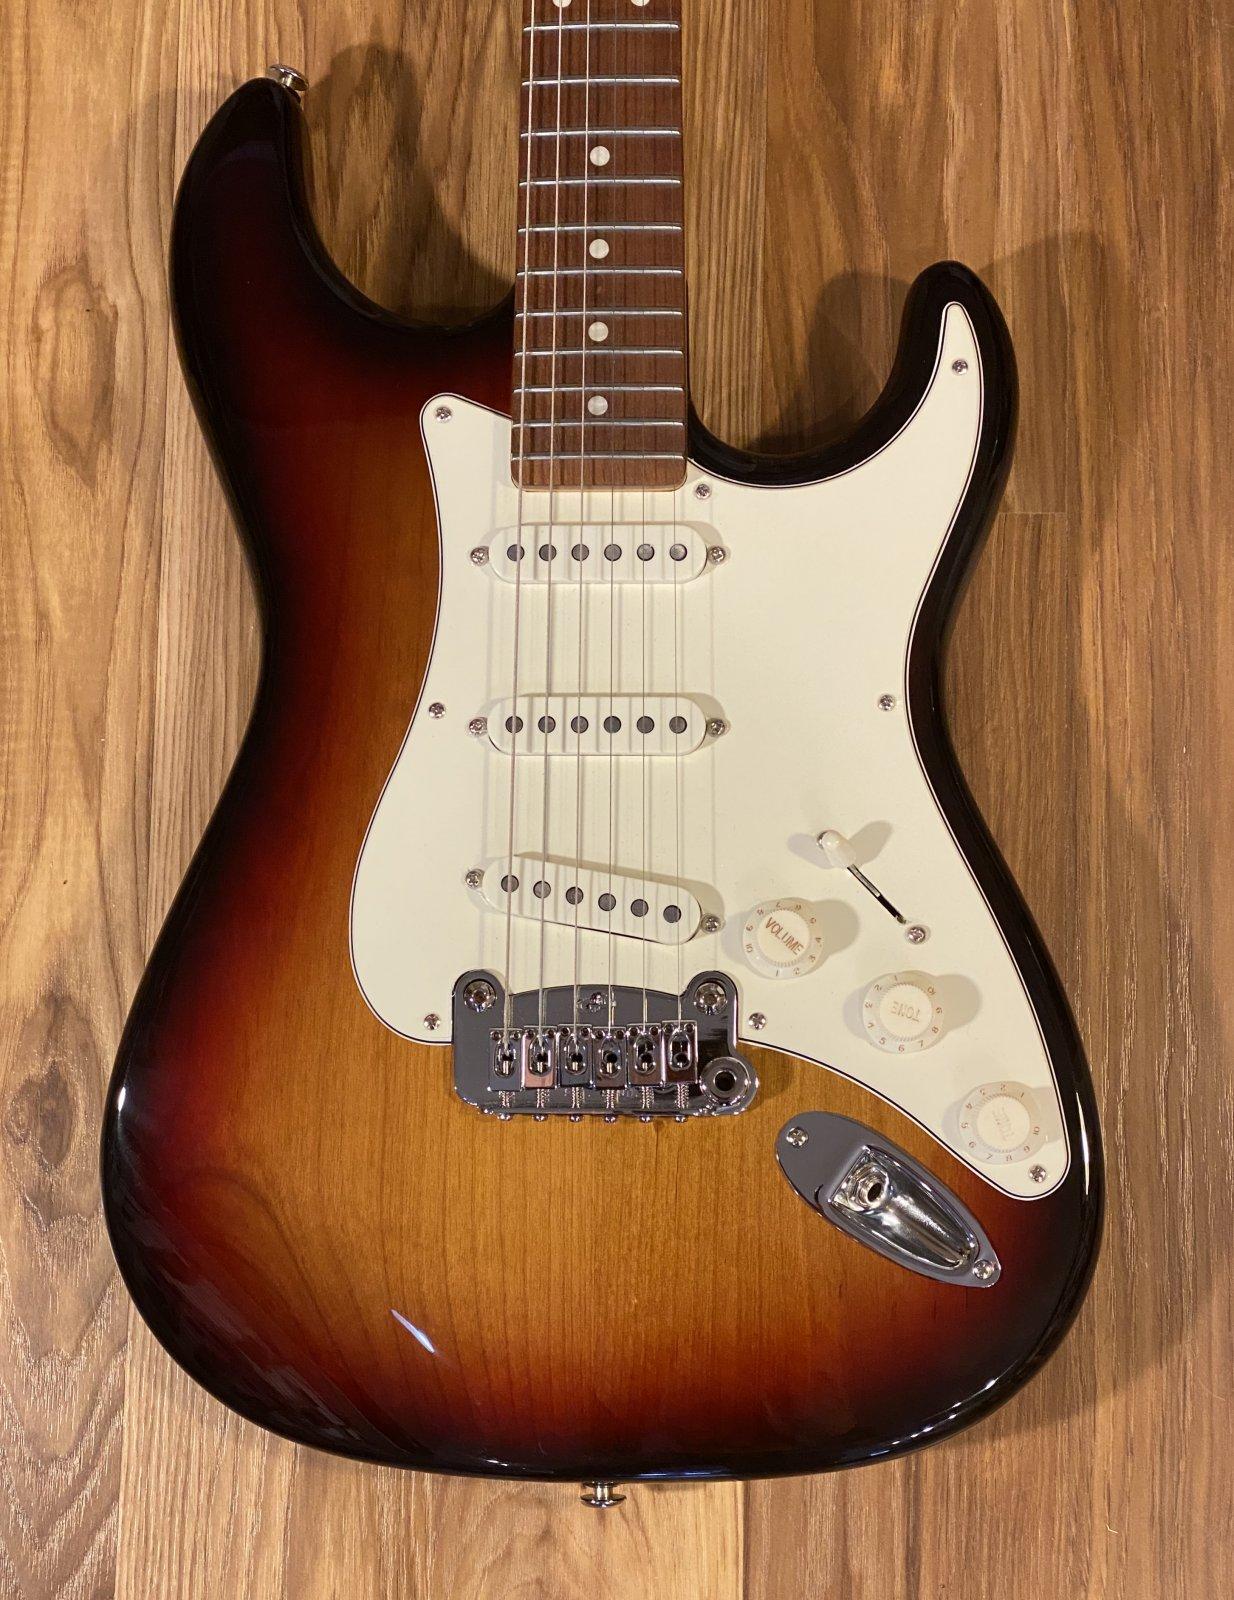 G&L Fullerton Deluxe Legacy Electric Guitar 3-Tone Sunburst